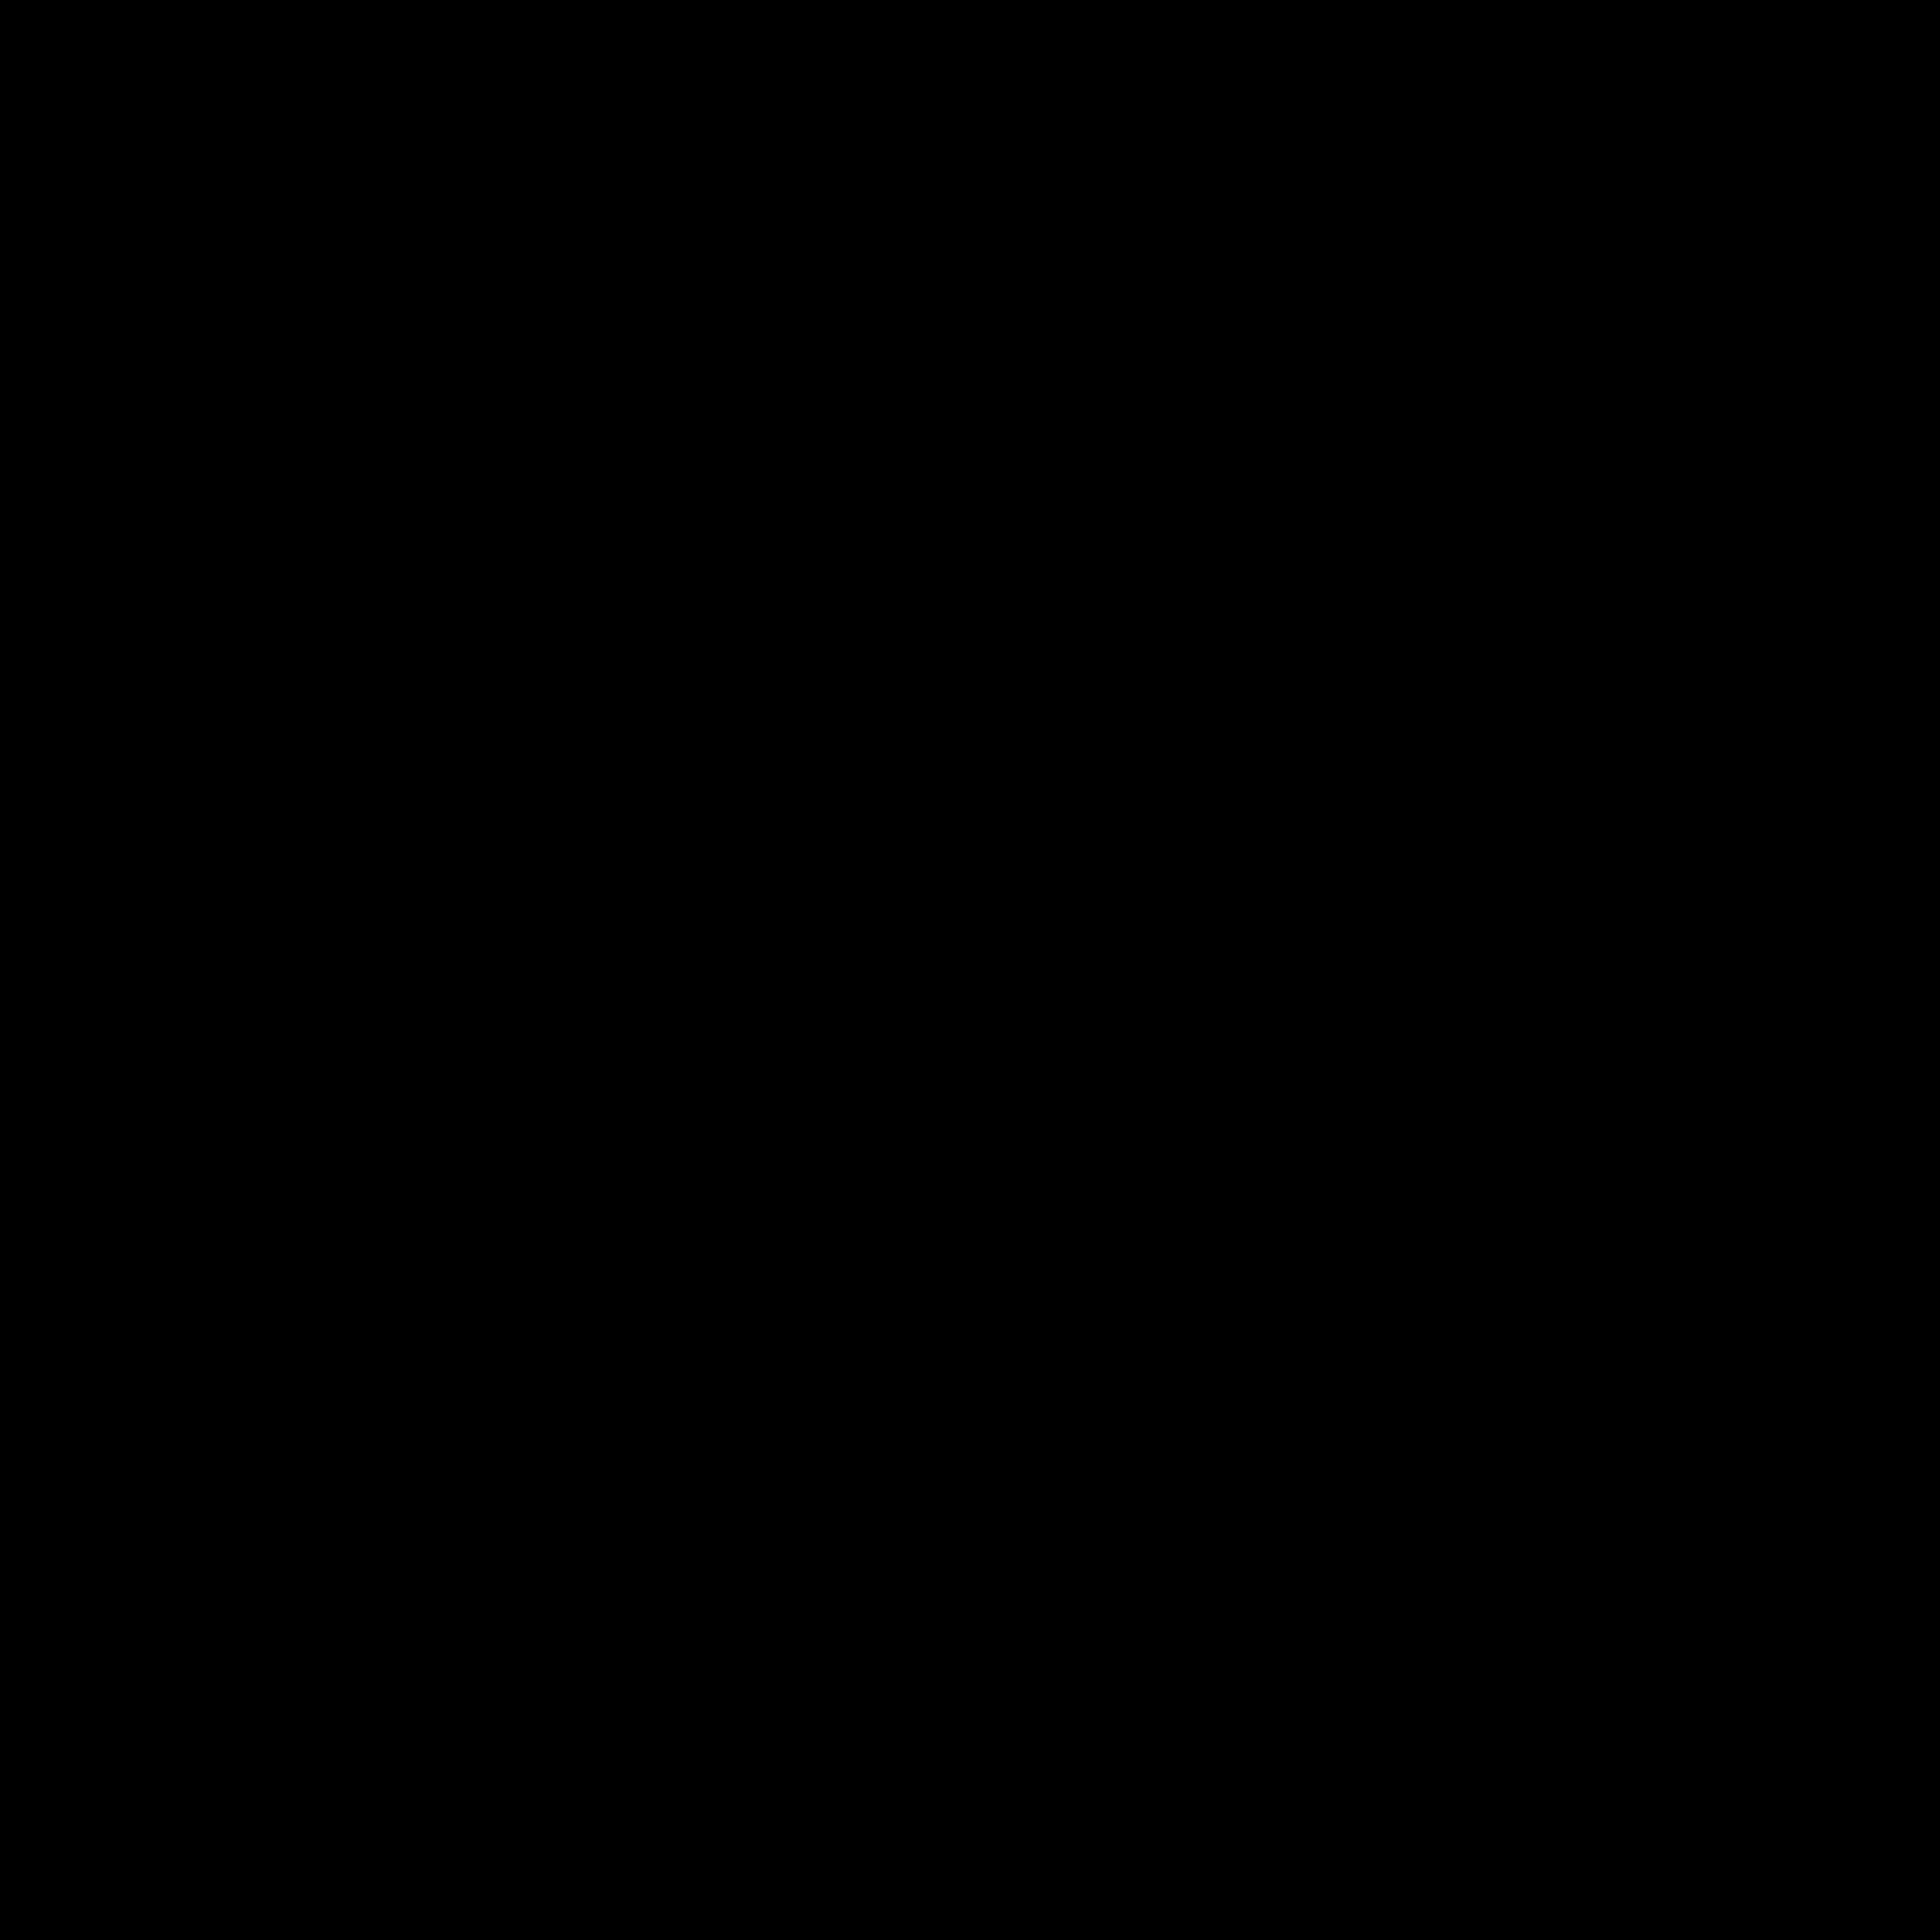 2000x2000 Filesquare Diamond (Shape).svg